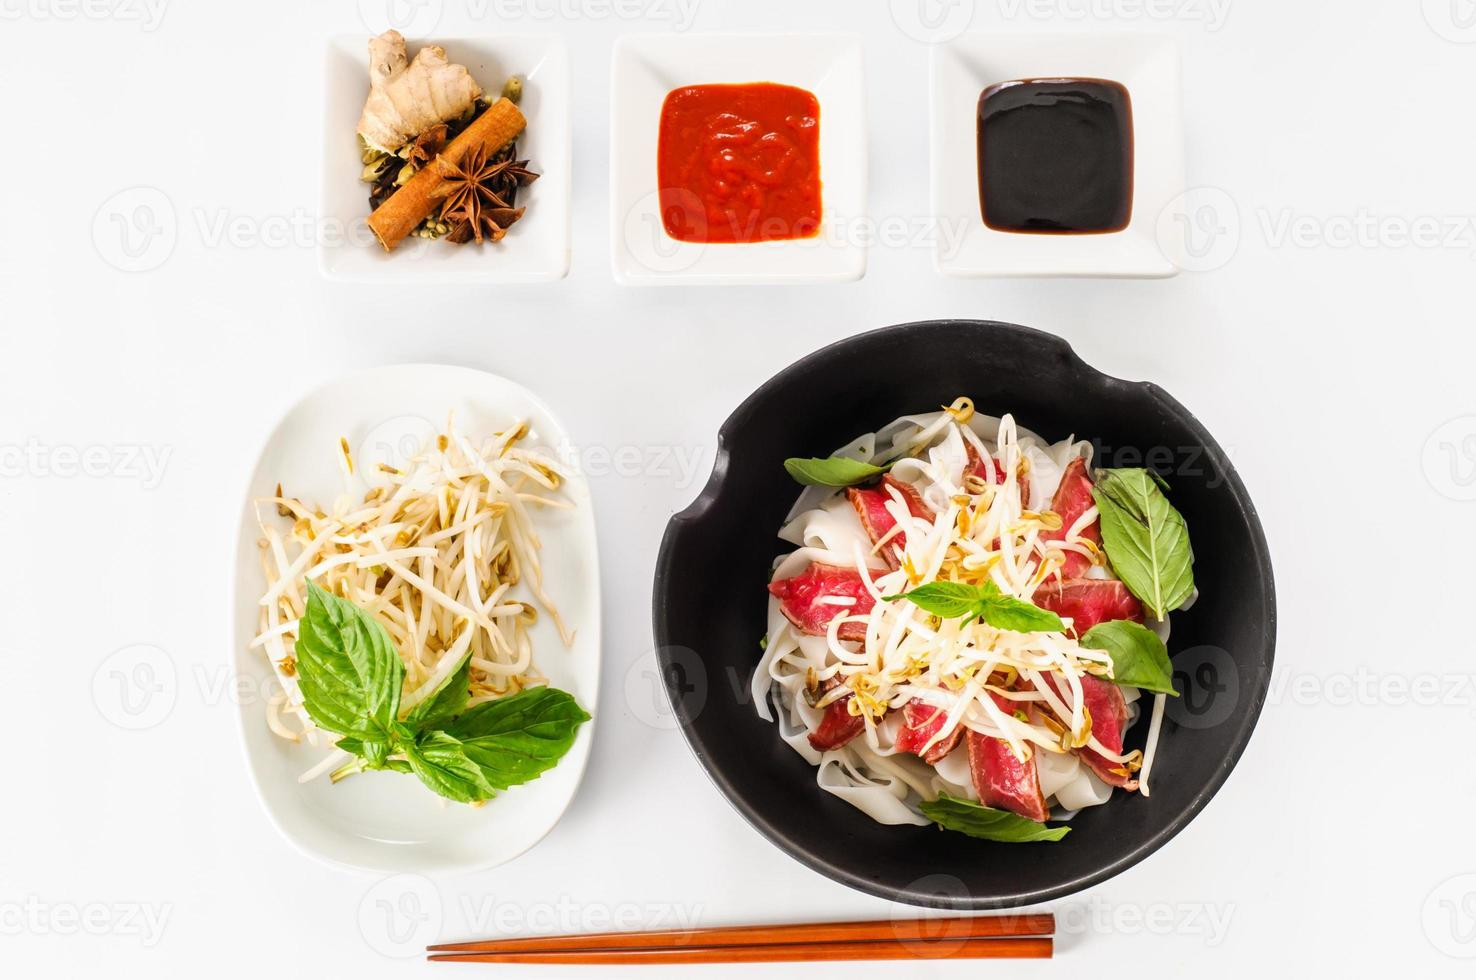 pho - zuppa di noodle vietnamita rara di manzo foto